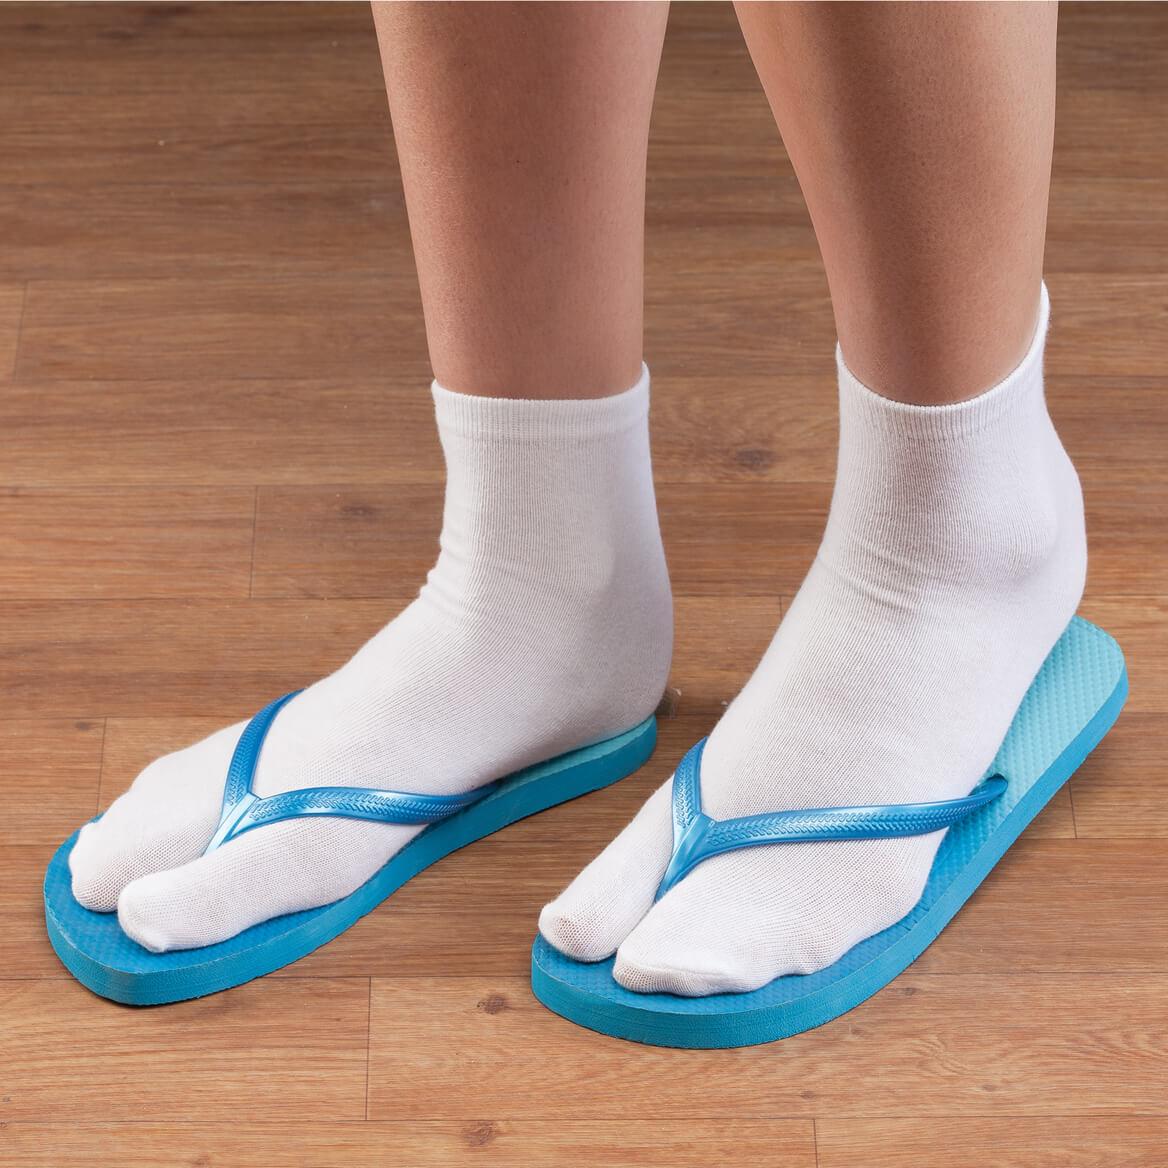 Split-Toe Flip Flop Socks, 1 Pair-360122